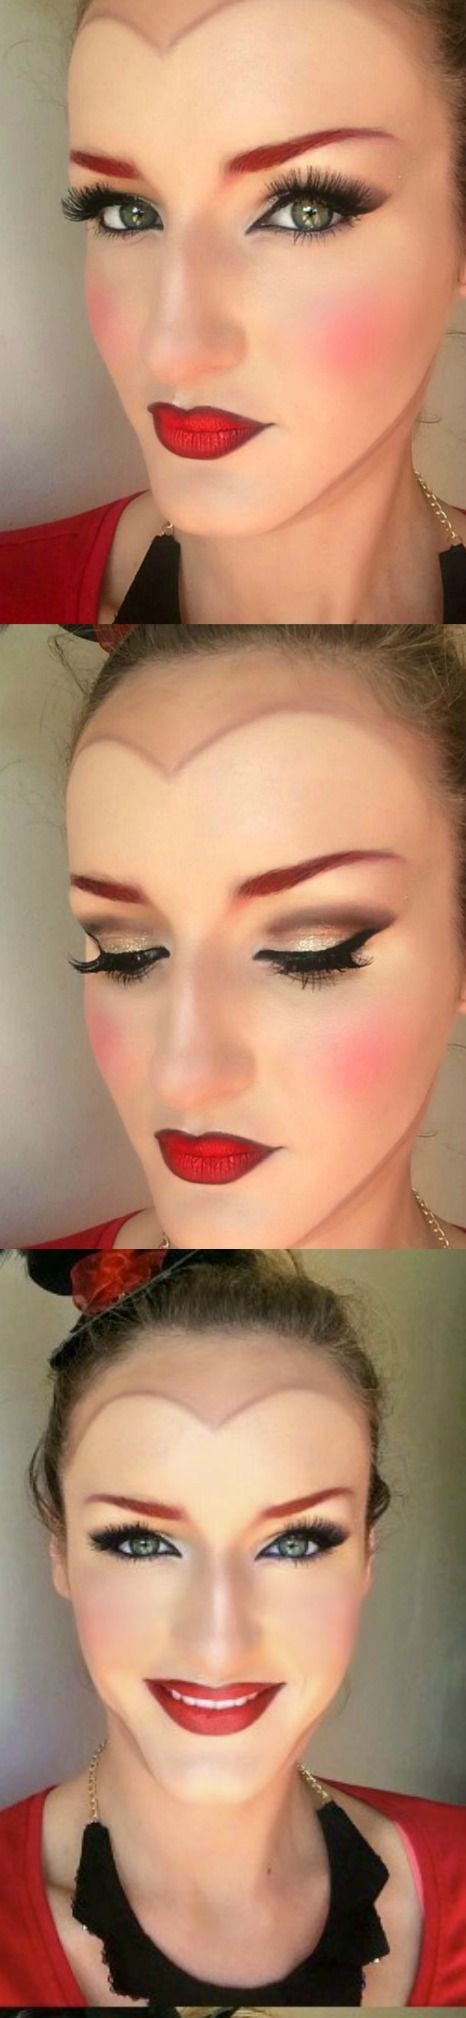 "Alice in Wonderland ""Queen of Hearts"" Makeup for Halloween on prettymuchblog.com"